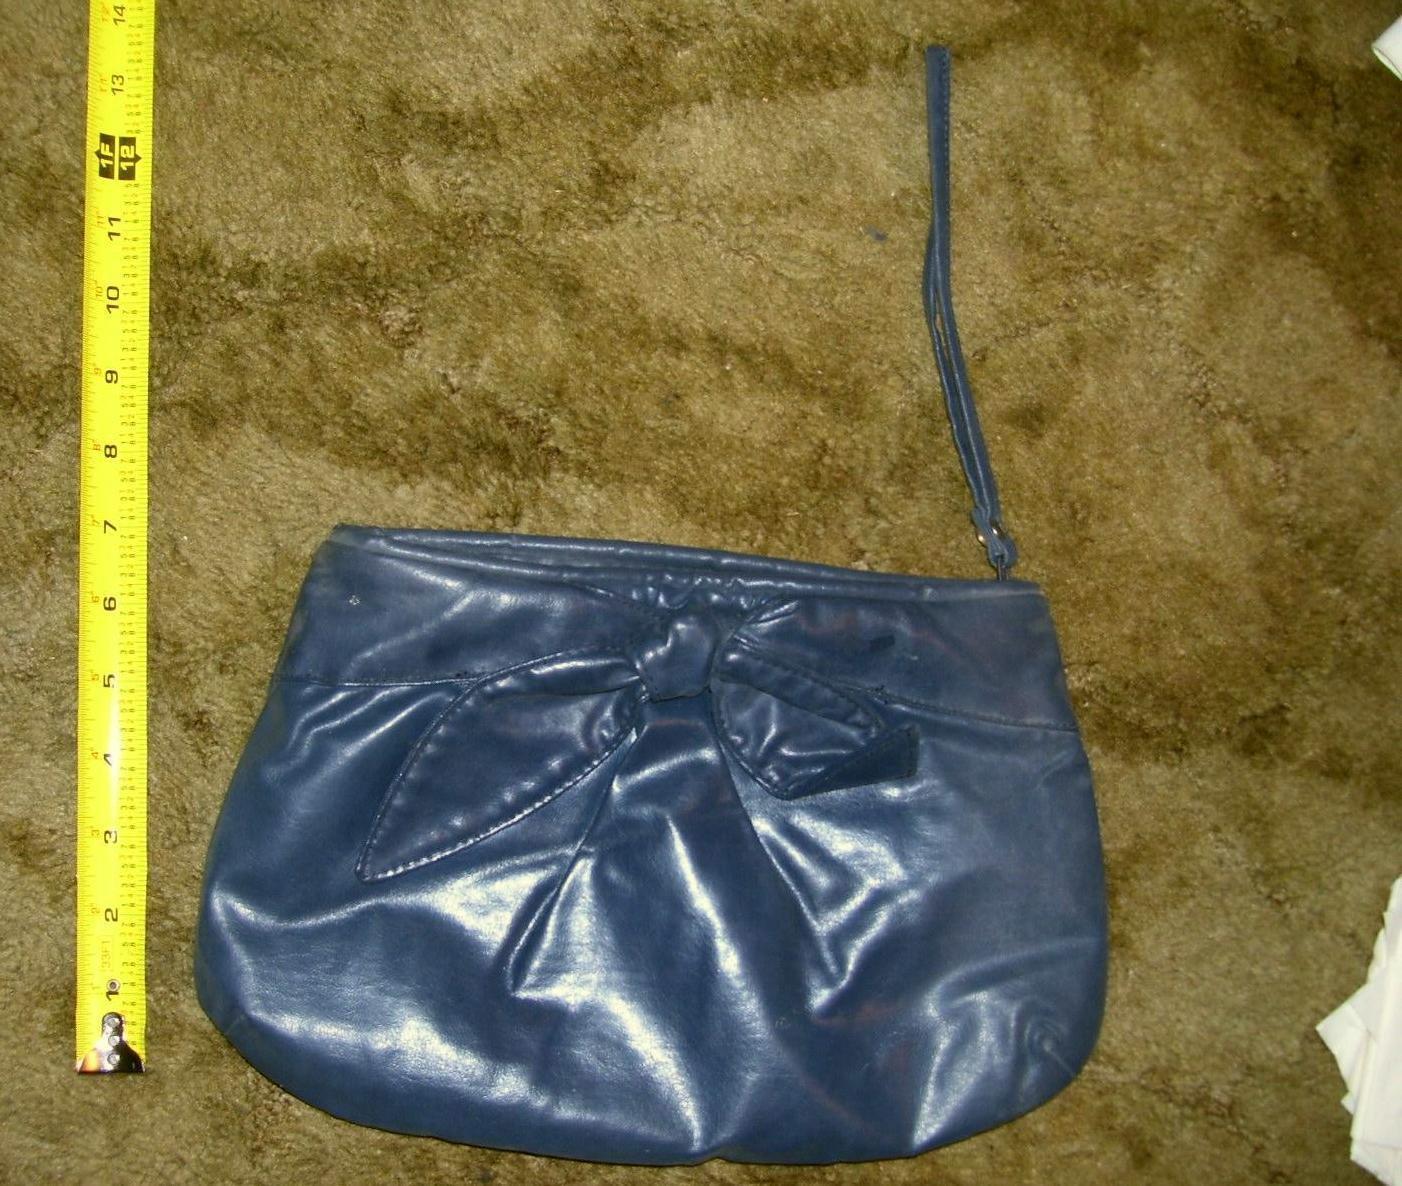 Vintage World Fashion Right Dark Blue / Charcoal Shade Clutch Handbag